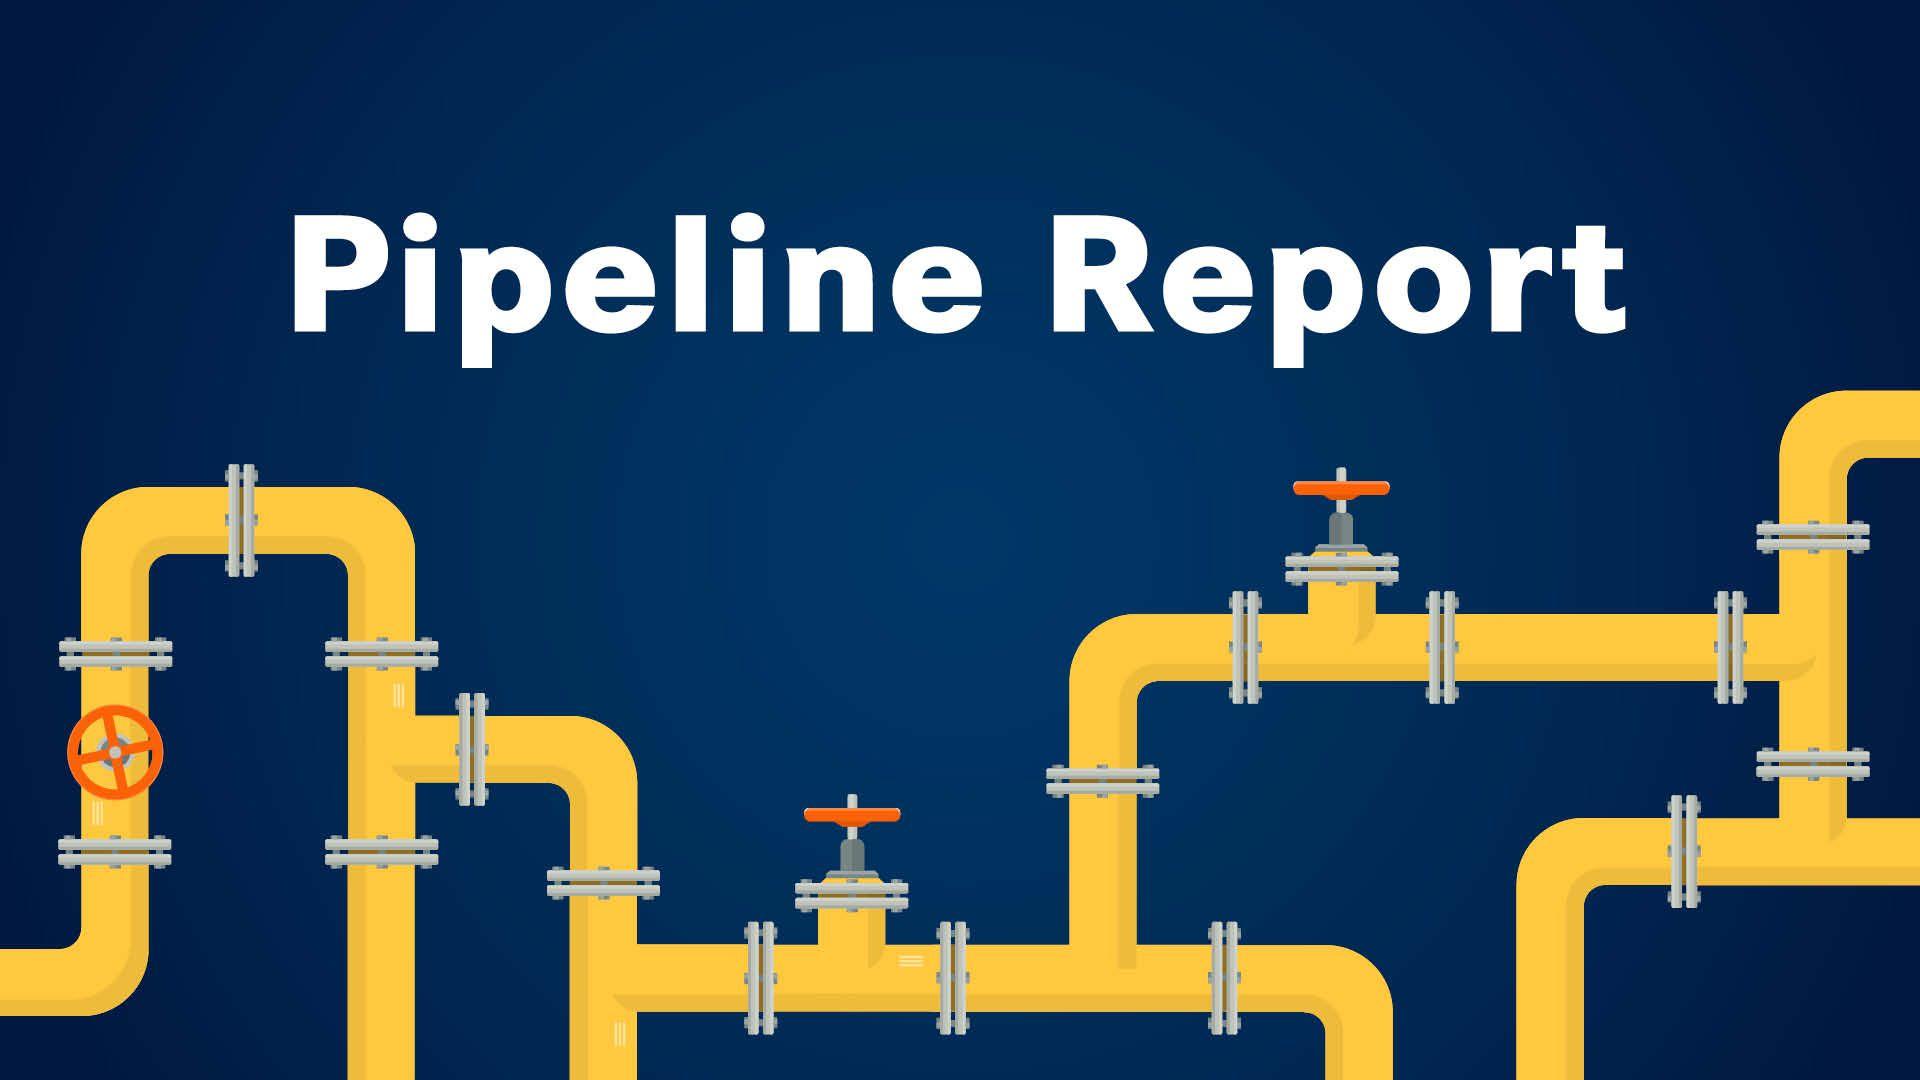 Pipeline Report | <b>Pipeline Report: May 2021</b>